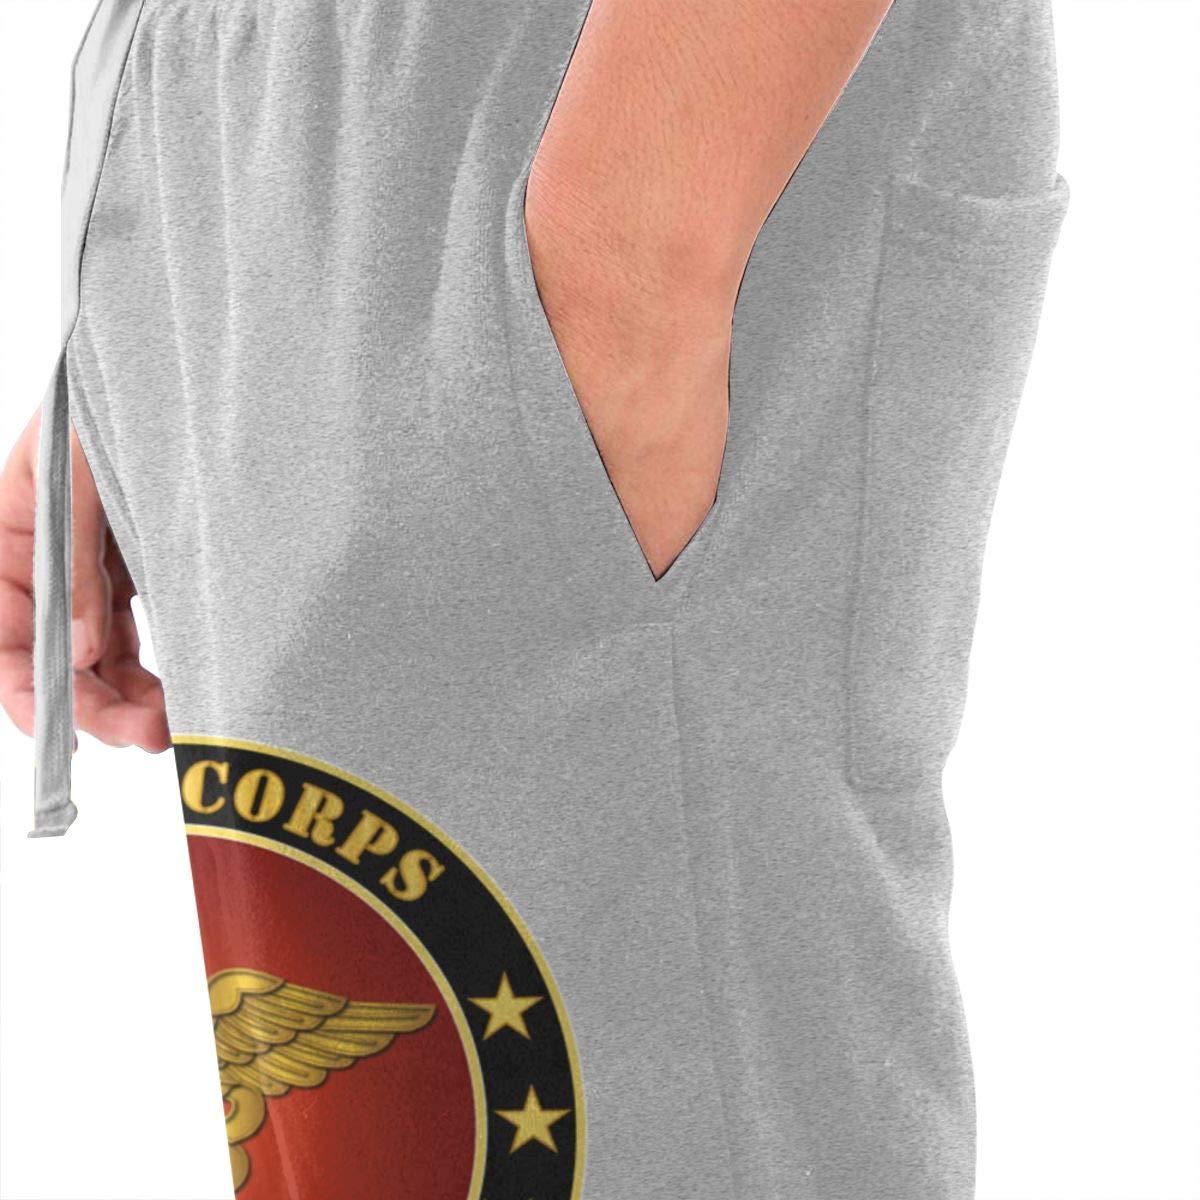 Dbou Army Nurse Corps Logo Drawstring Waist,100/% Cotton,Elastic Waist Cuffed,Jogger Sweatpants Black